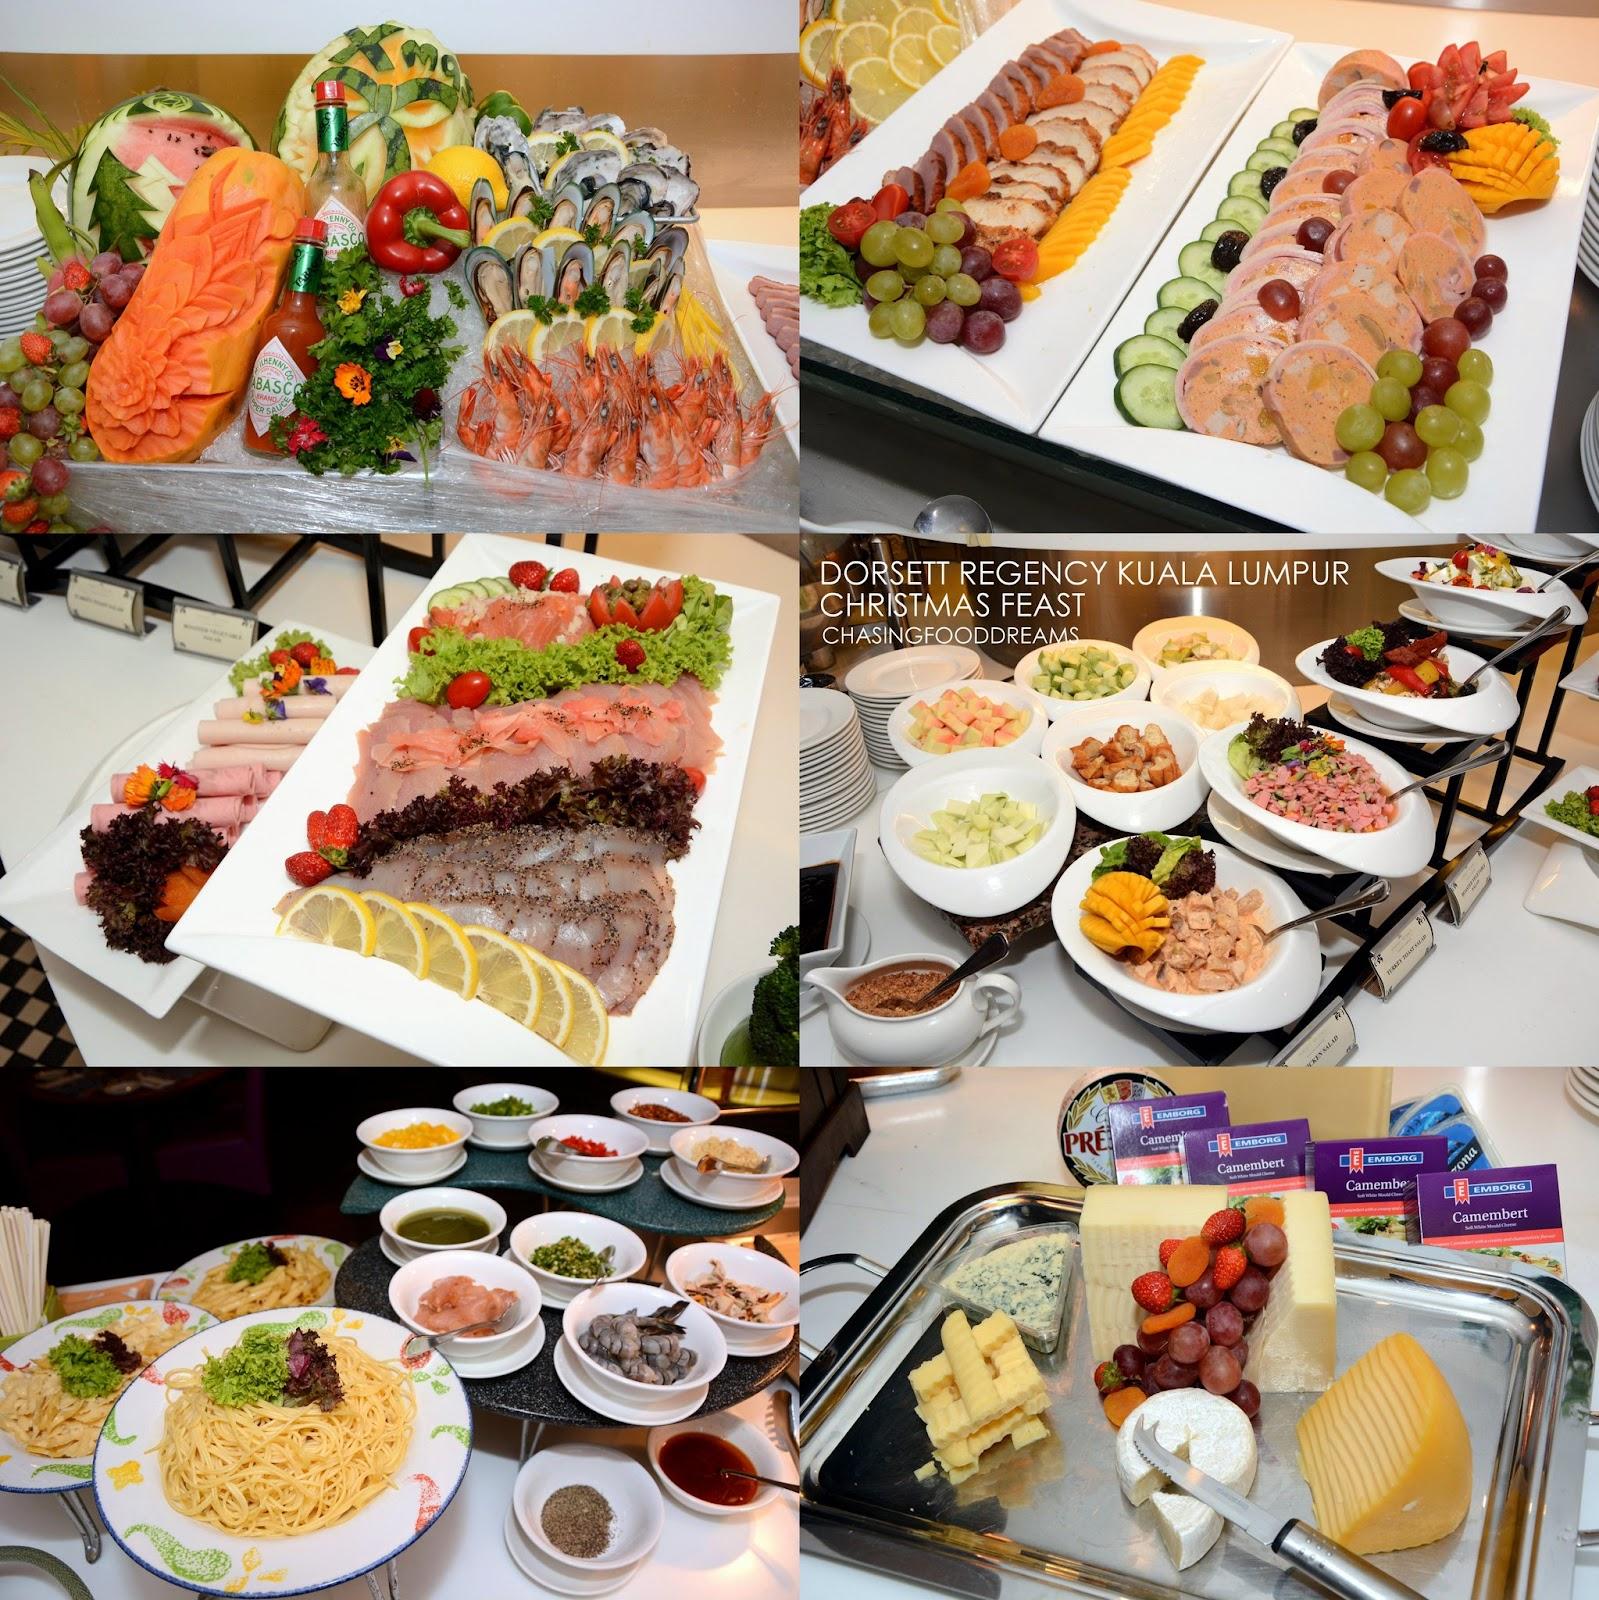 Chasing Food Dreams Checkers Caf Dorsett Regency Kuala